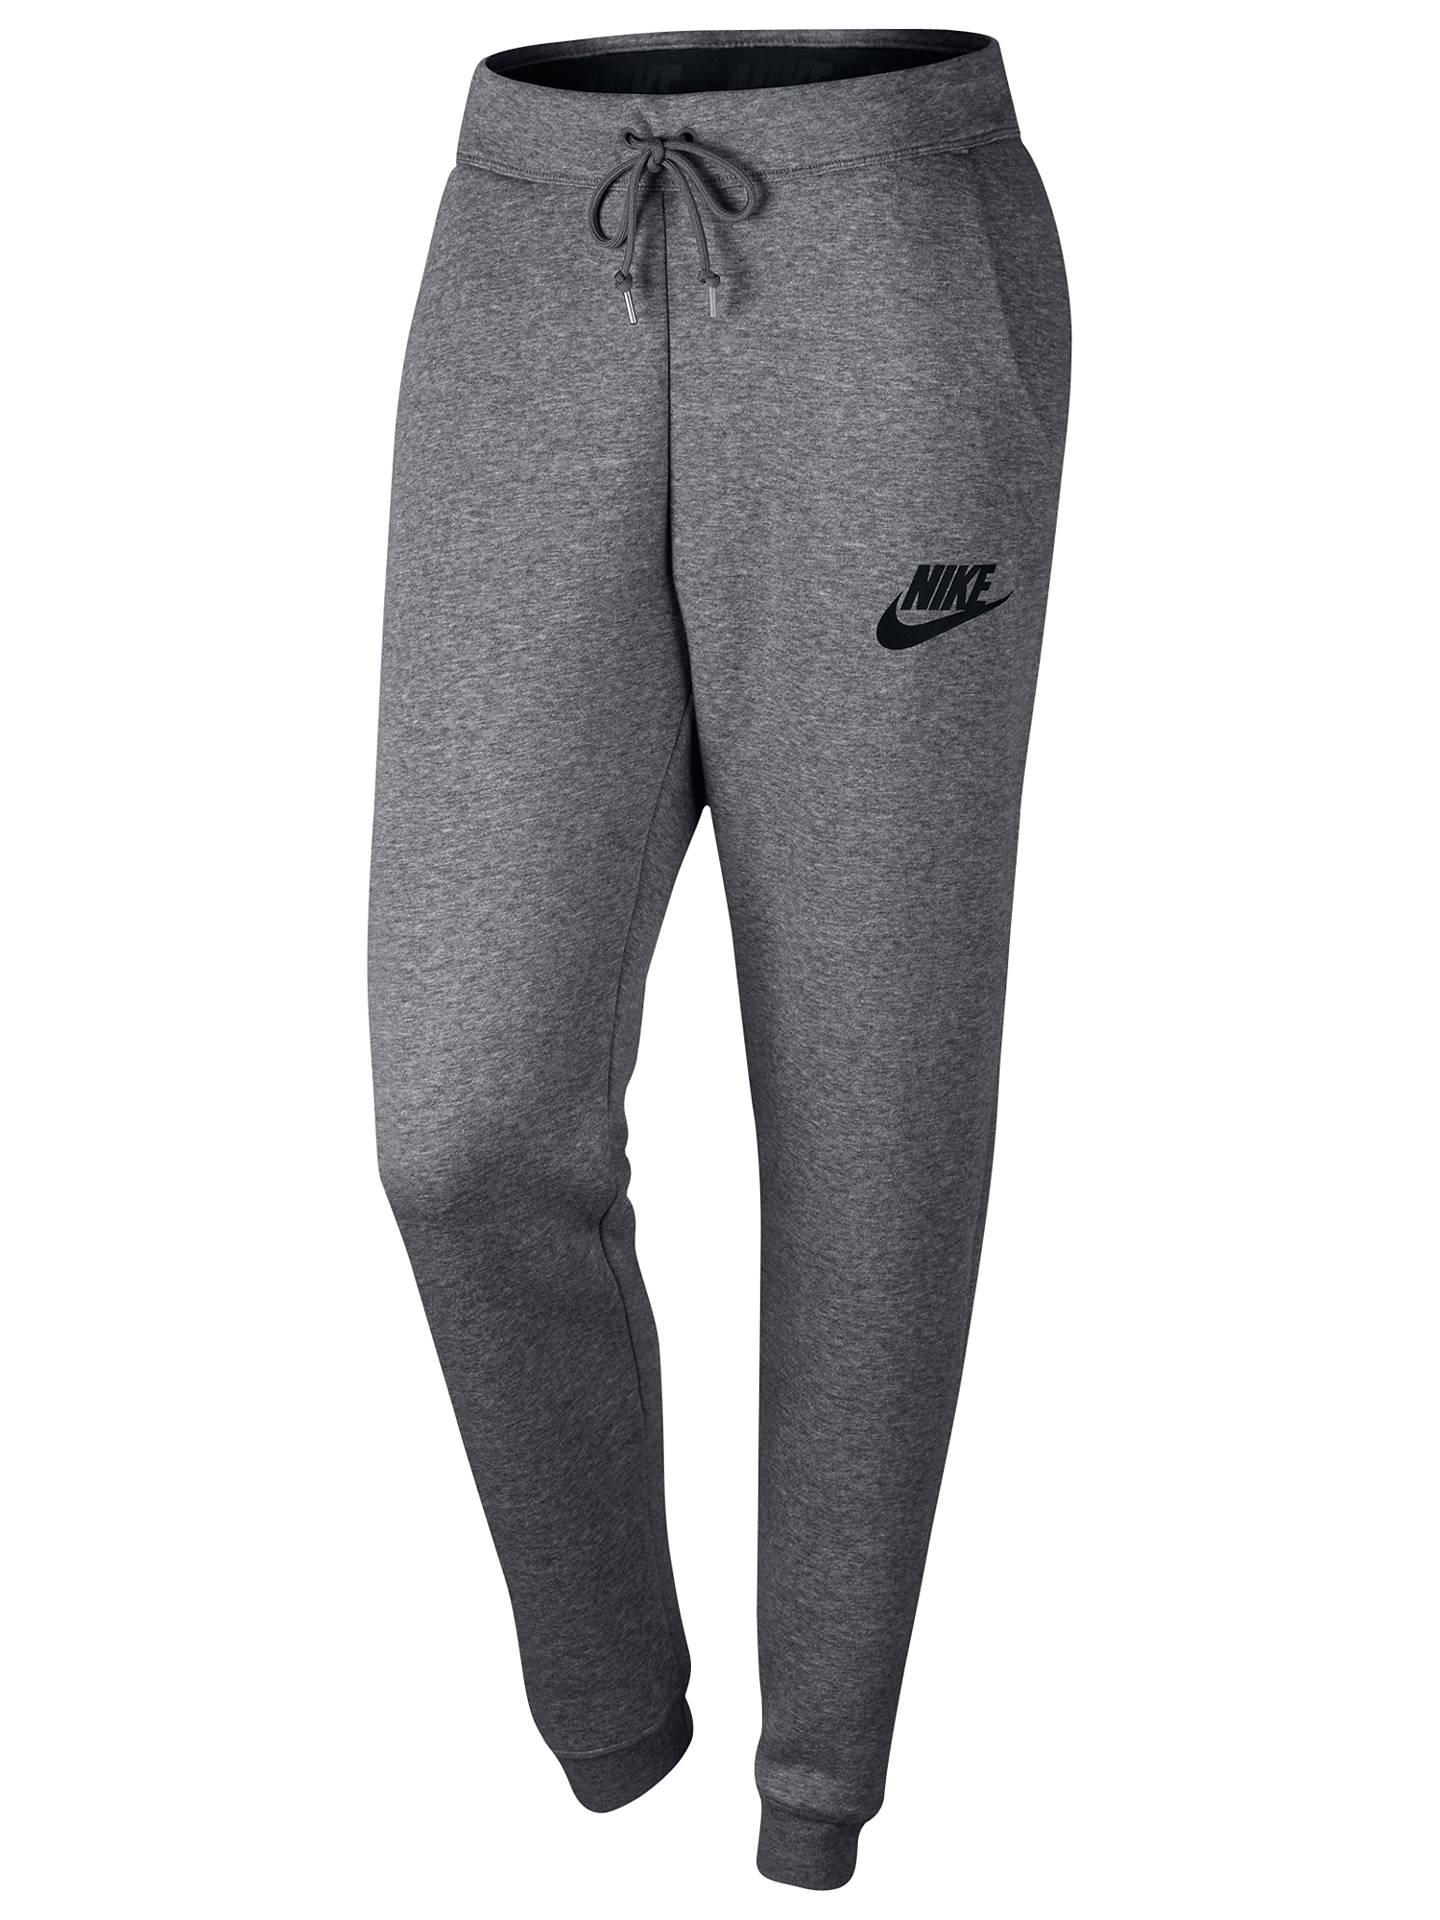 132658922fe1 Nike Sportswear Rally Tracksuit Bottoms at John Lewis   Partners